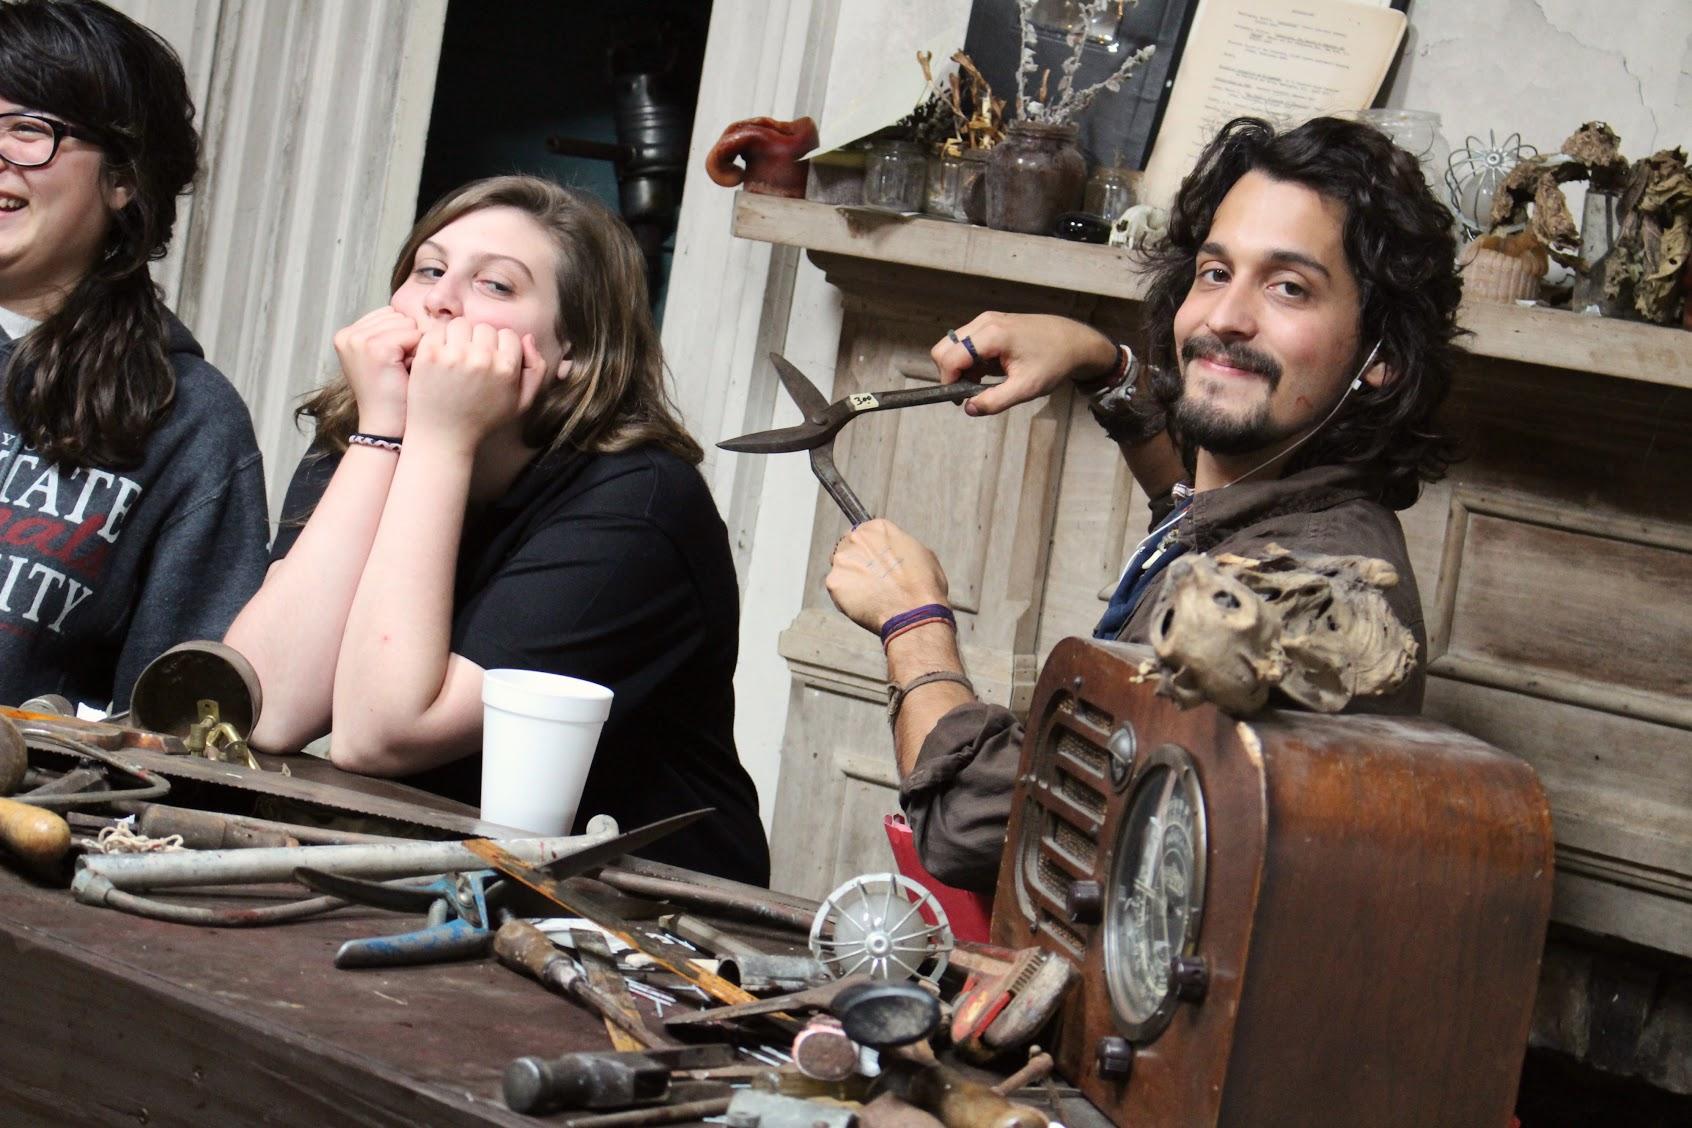 Abigail Urbik & Jac Kessler